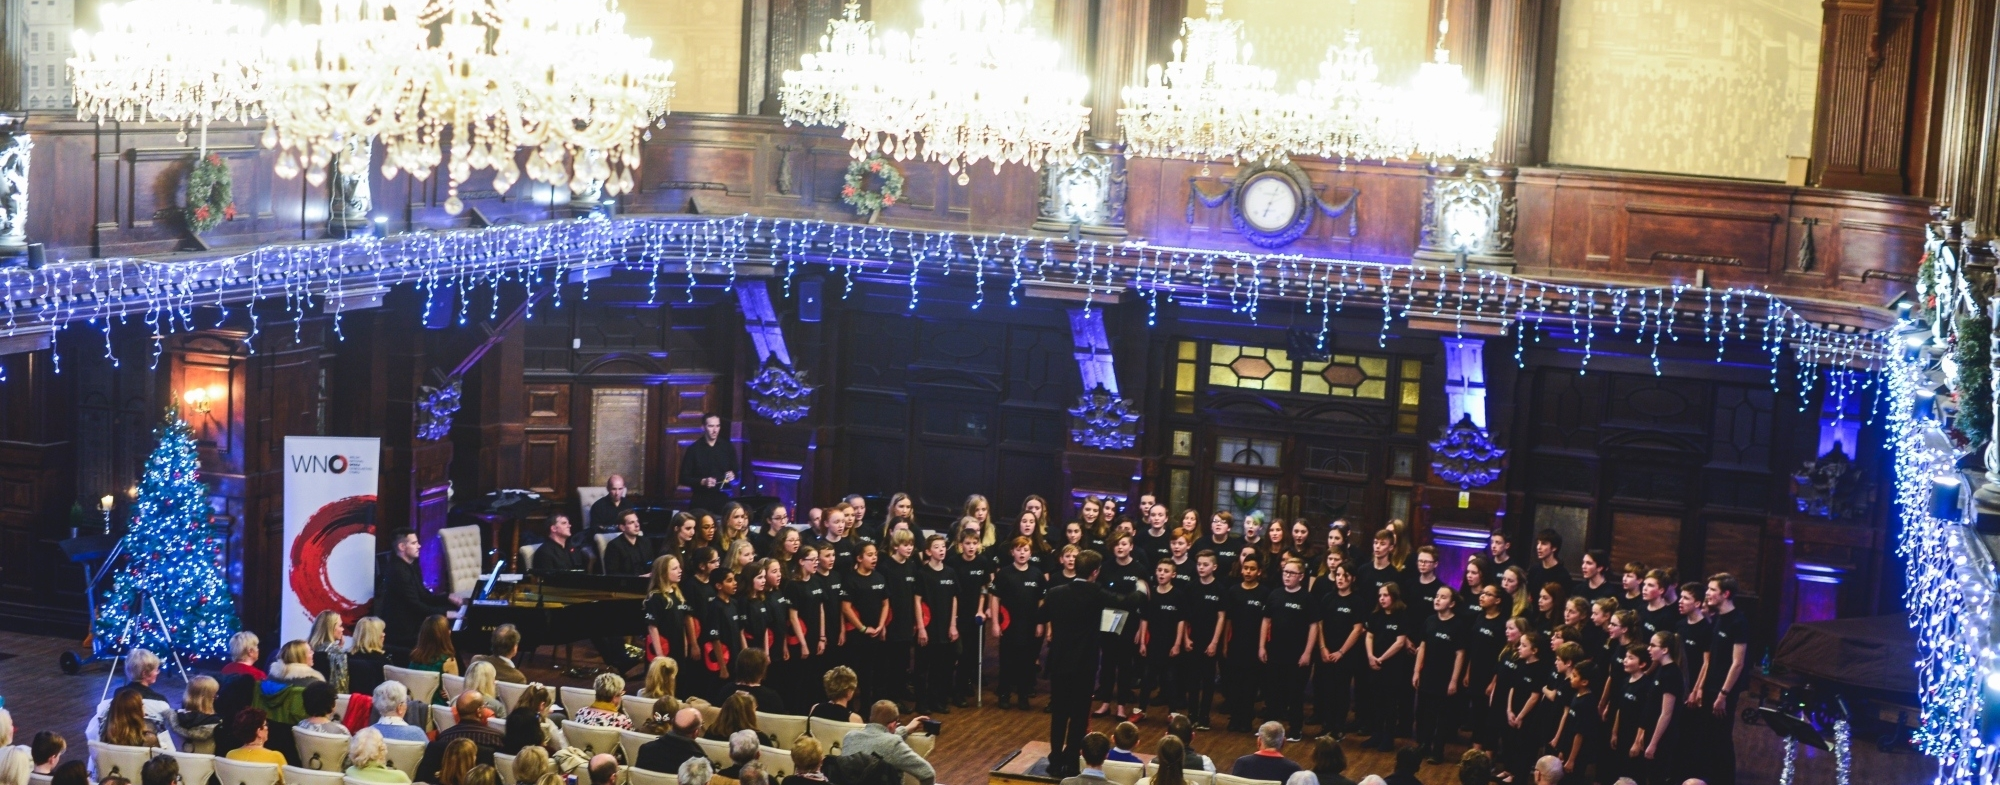 WNO Youth Opera and Community Chorus on stage.